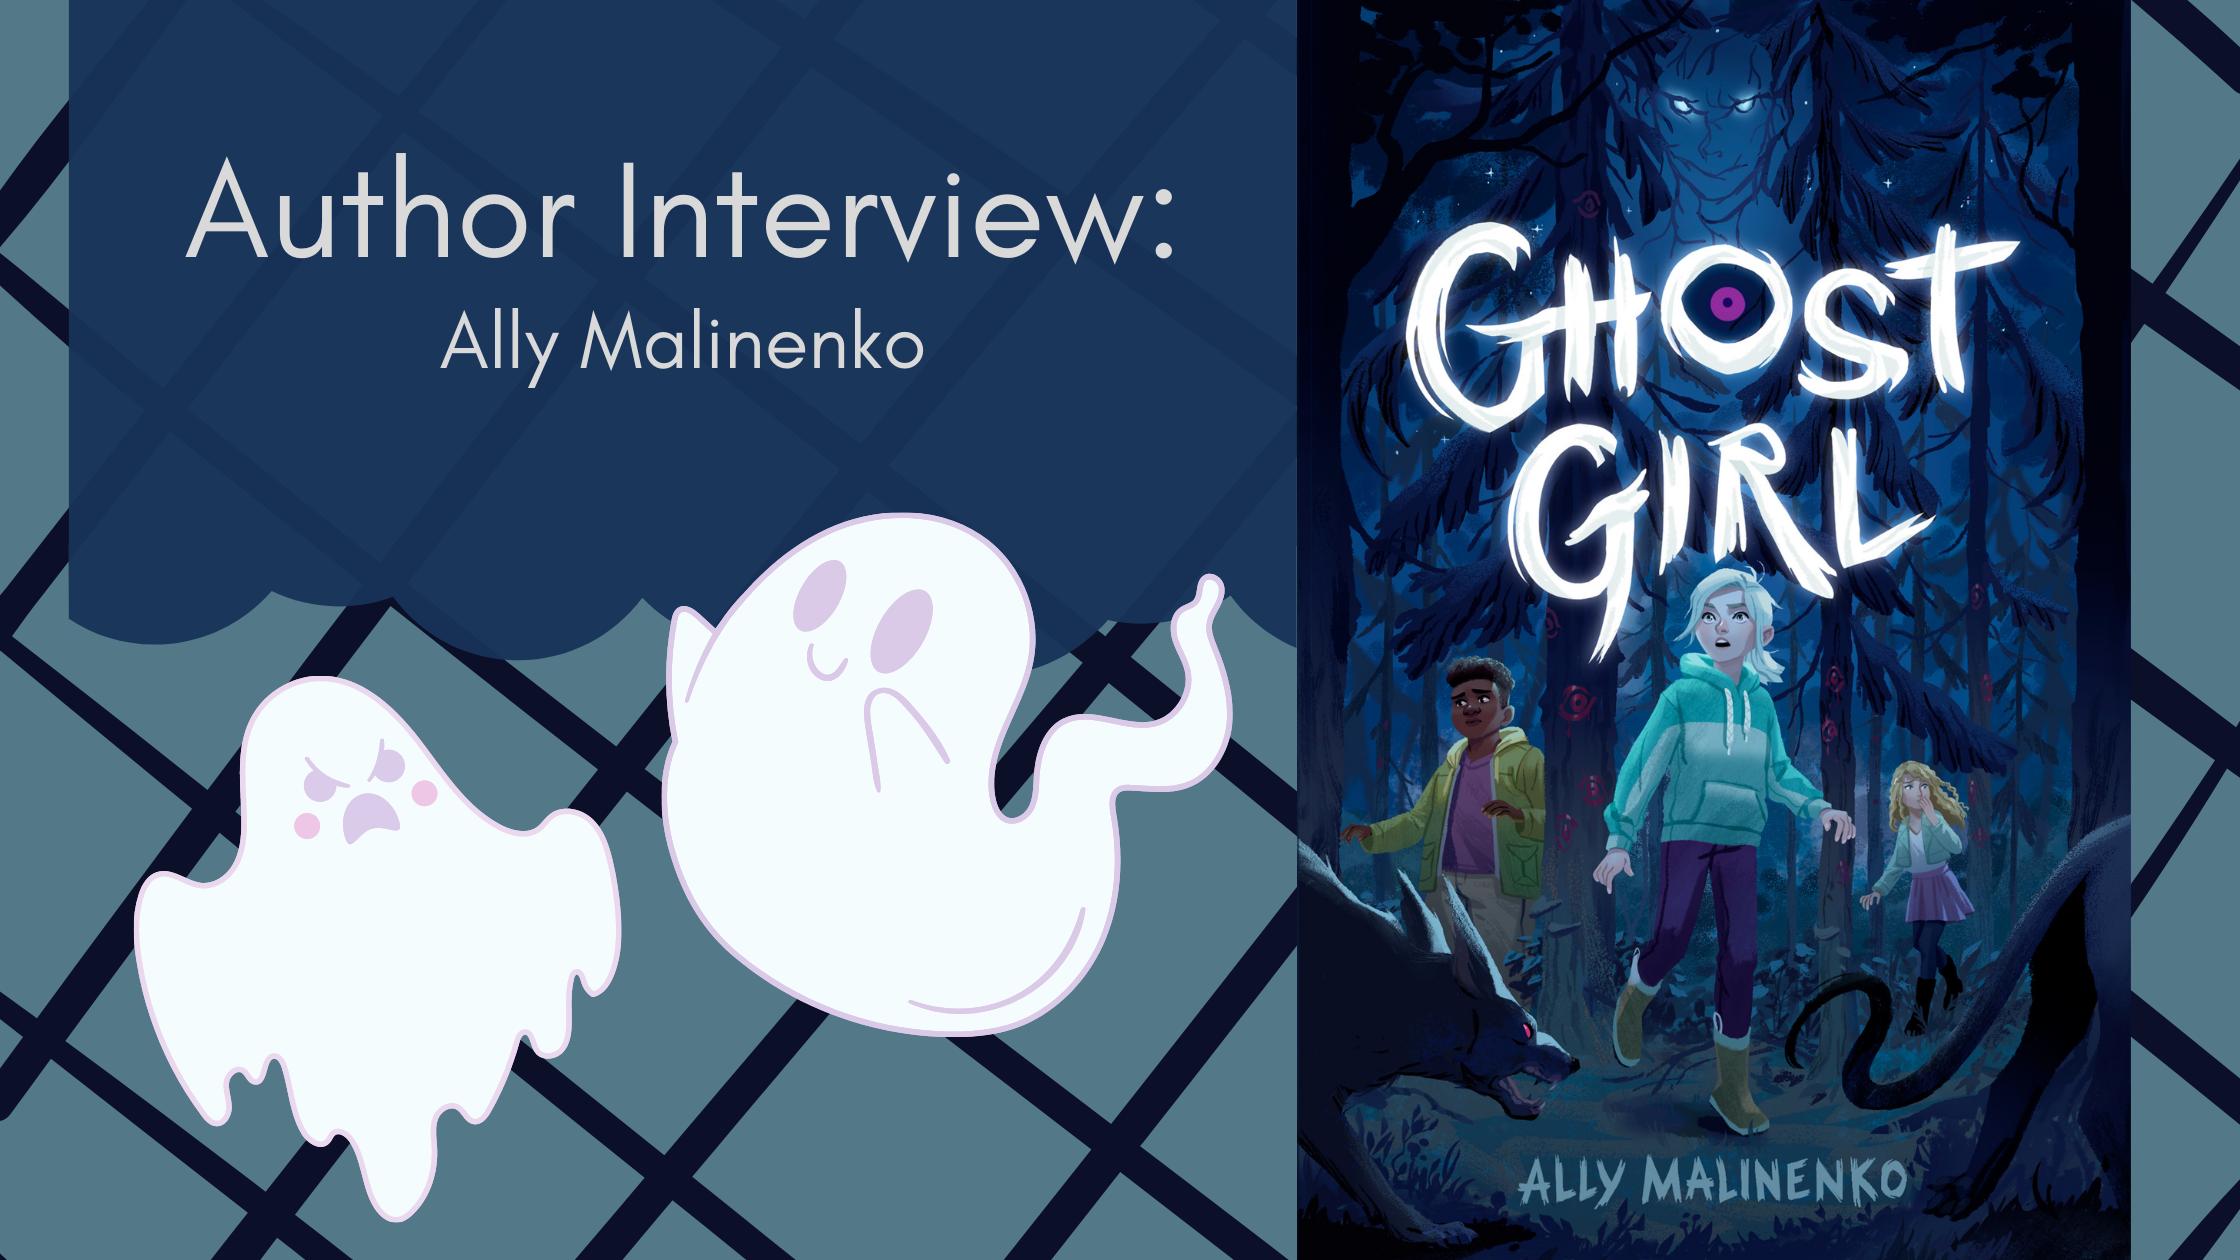 Author Interview: Ally Malinenko